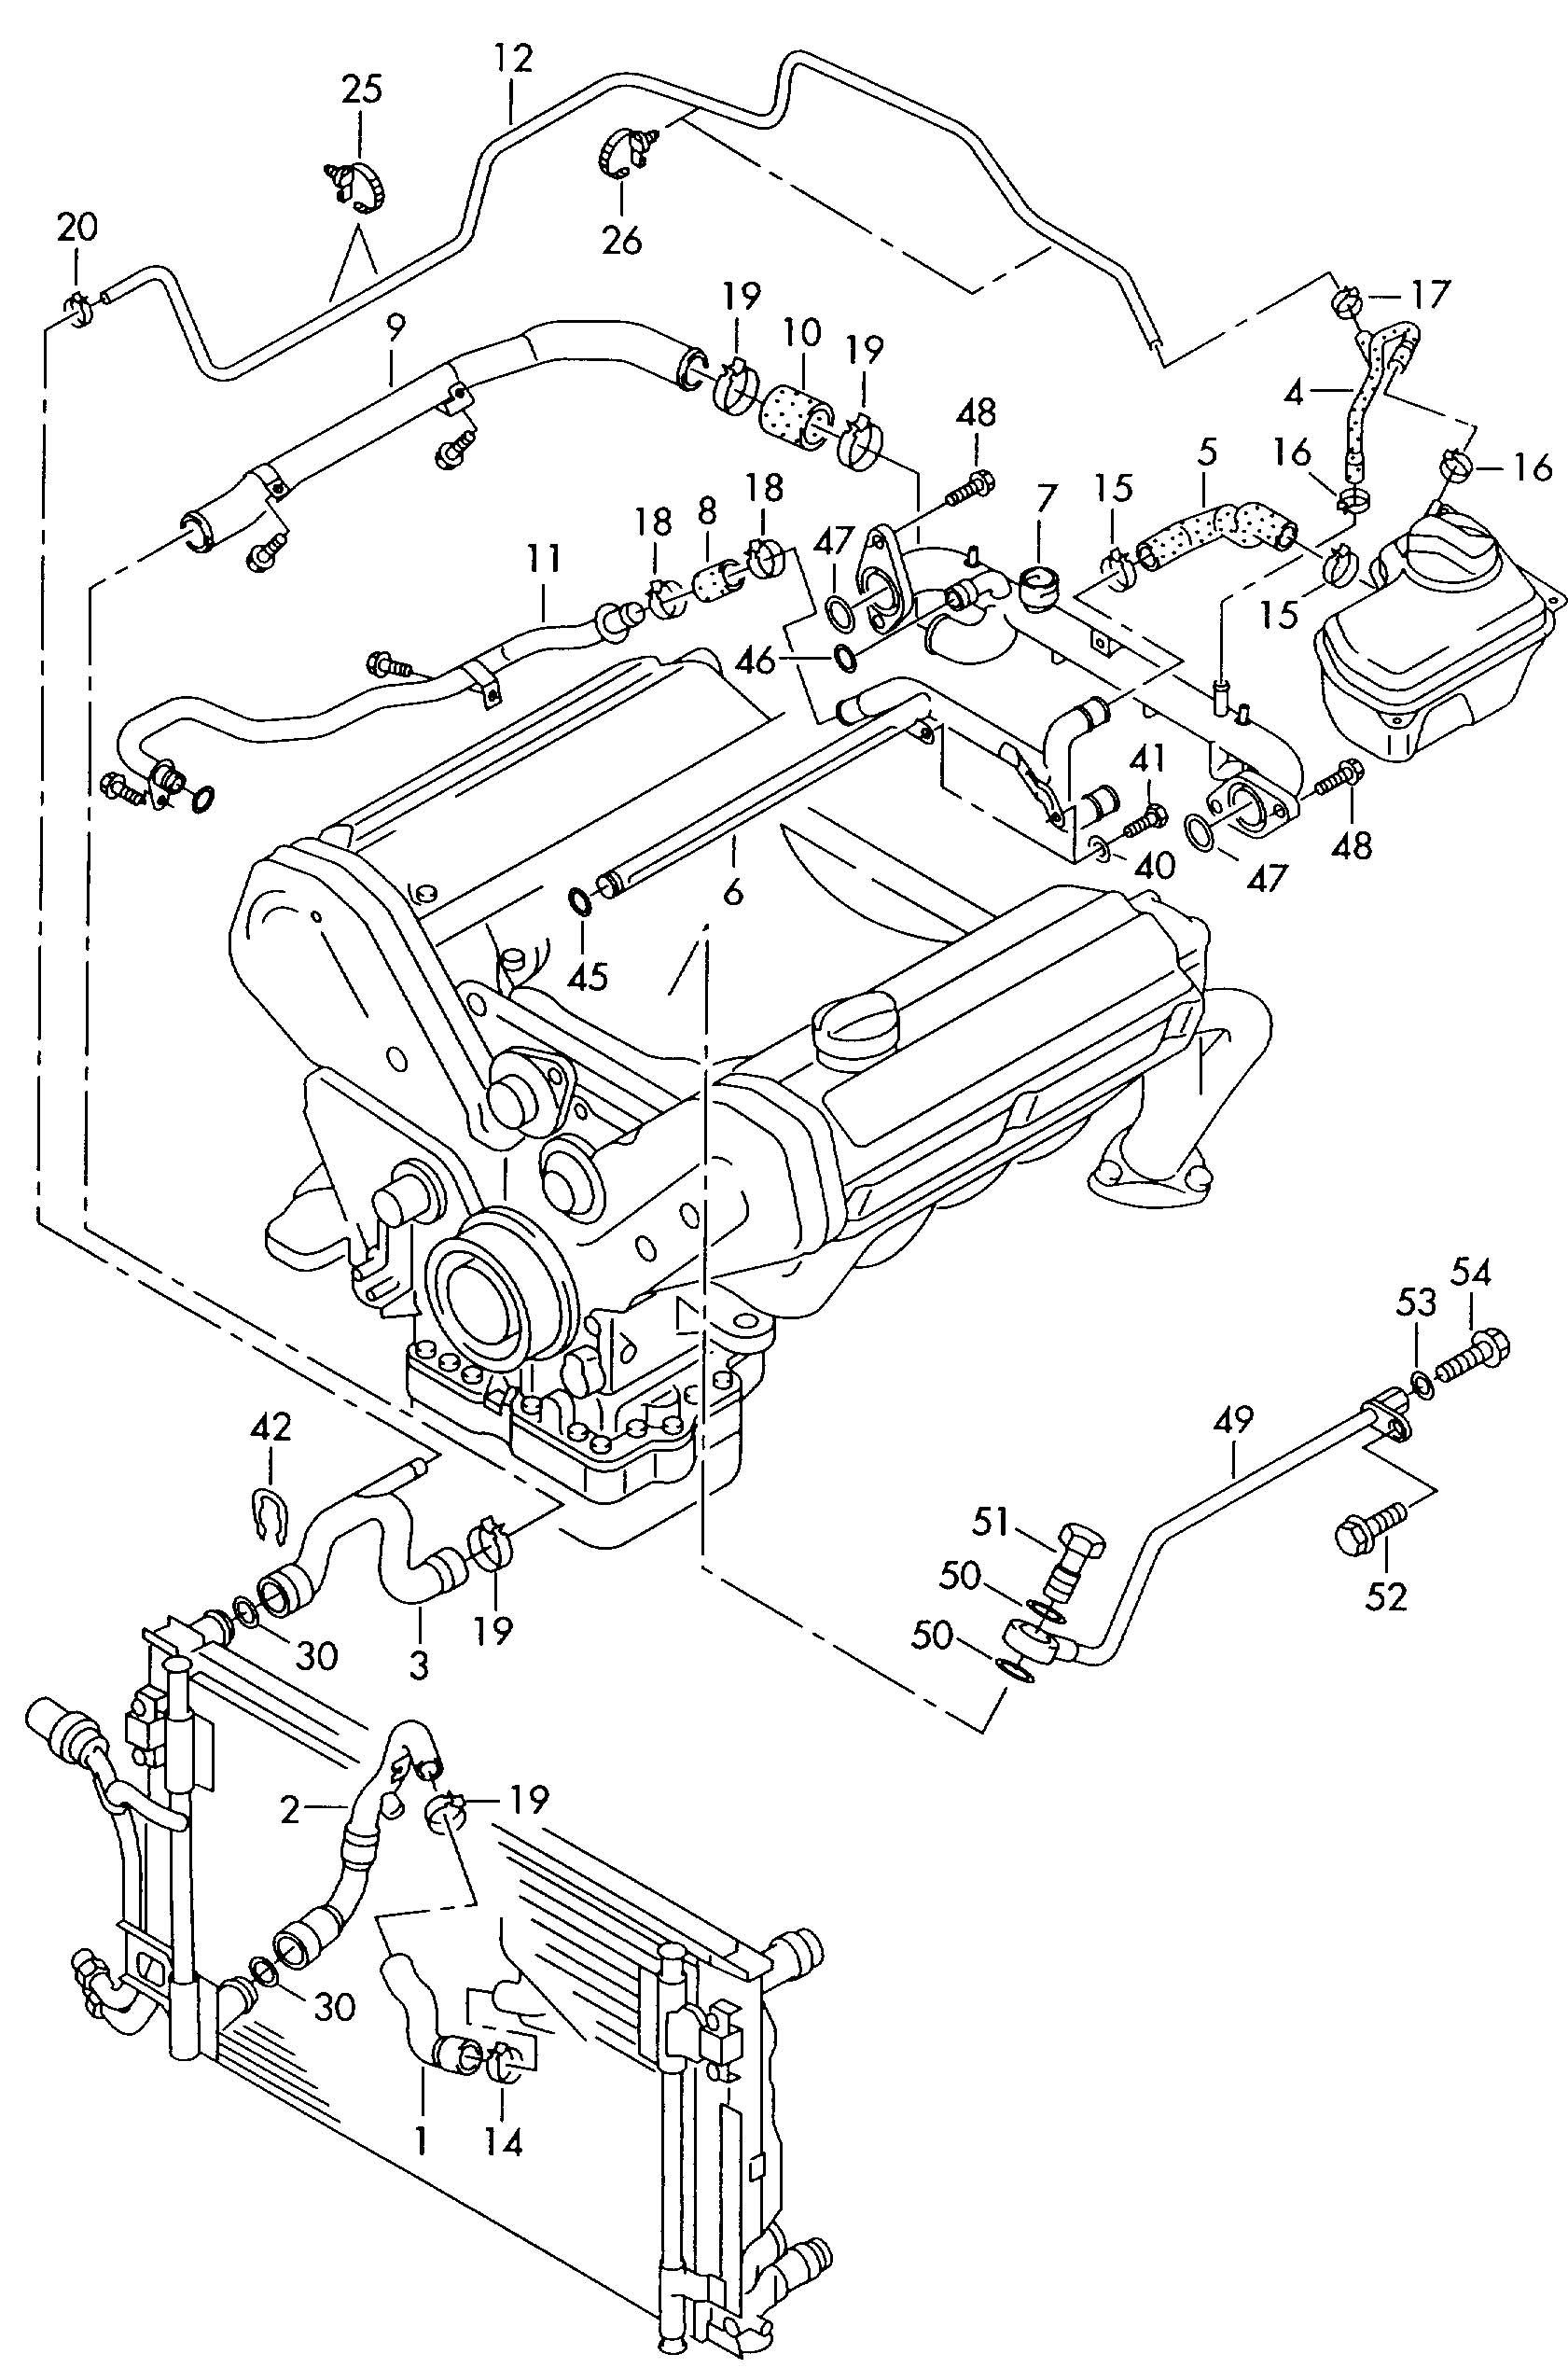 2002 Audi A6 3 0 Engine Diagram Wiring Diagram Page Mine Best A Mine Best A Granballodicomo It